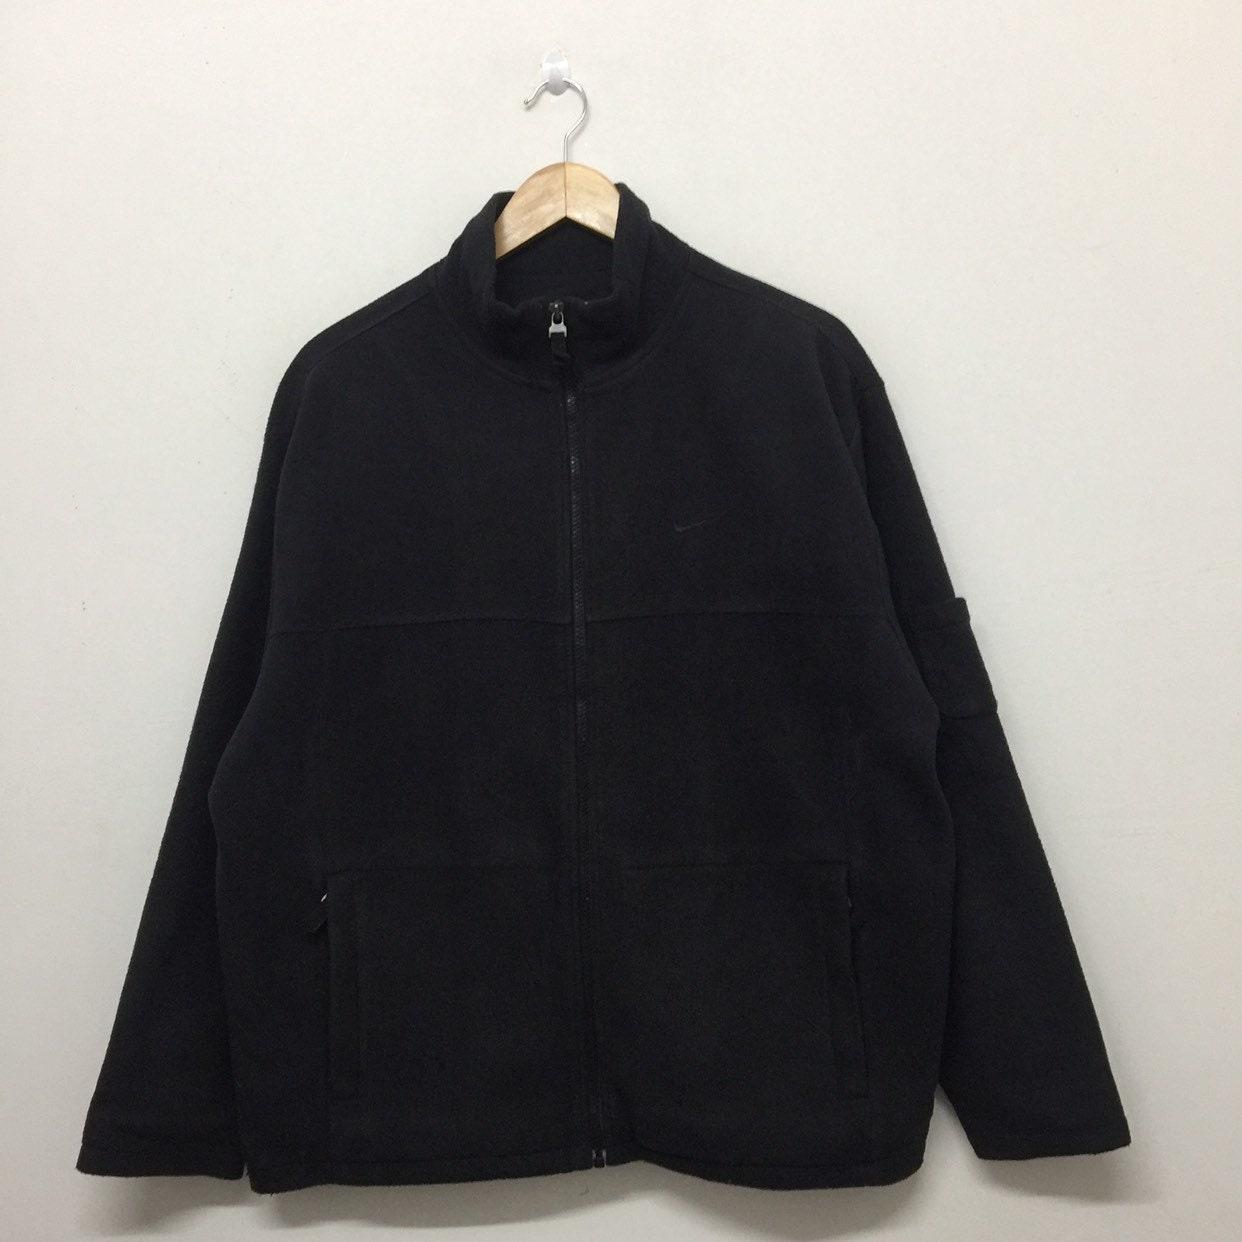 cf1bbdc67 Nike Fleece Jacket Mens Size M / Vintage Nike Small Logo Embroidery Full  Zip Black Fleece Jacket